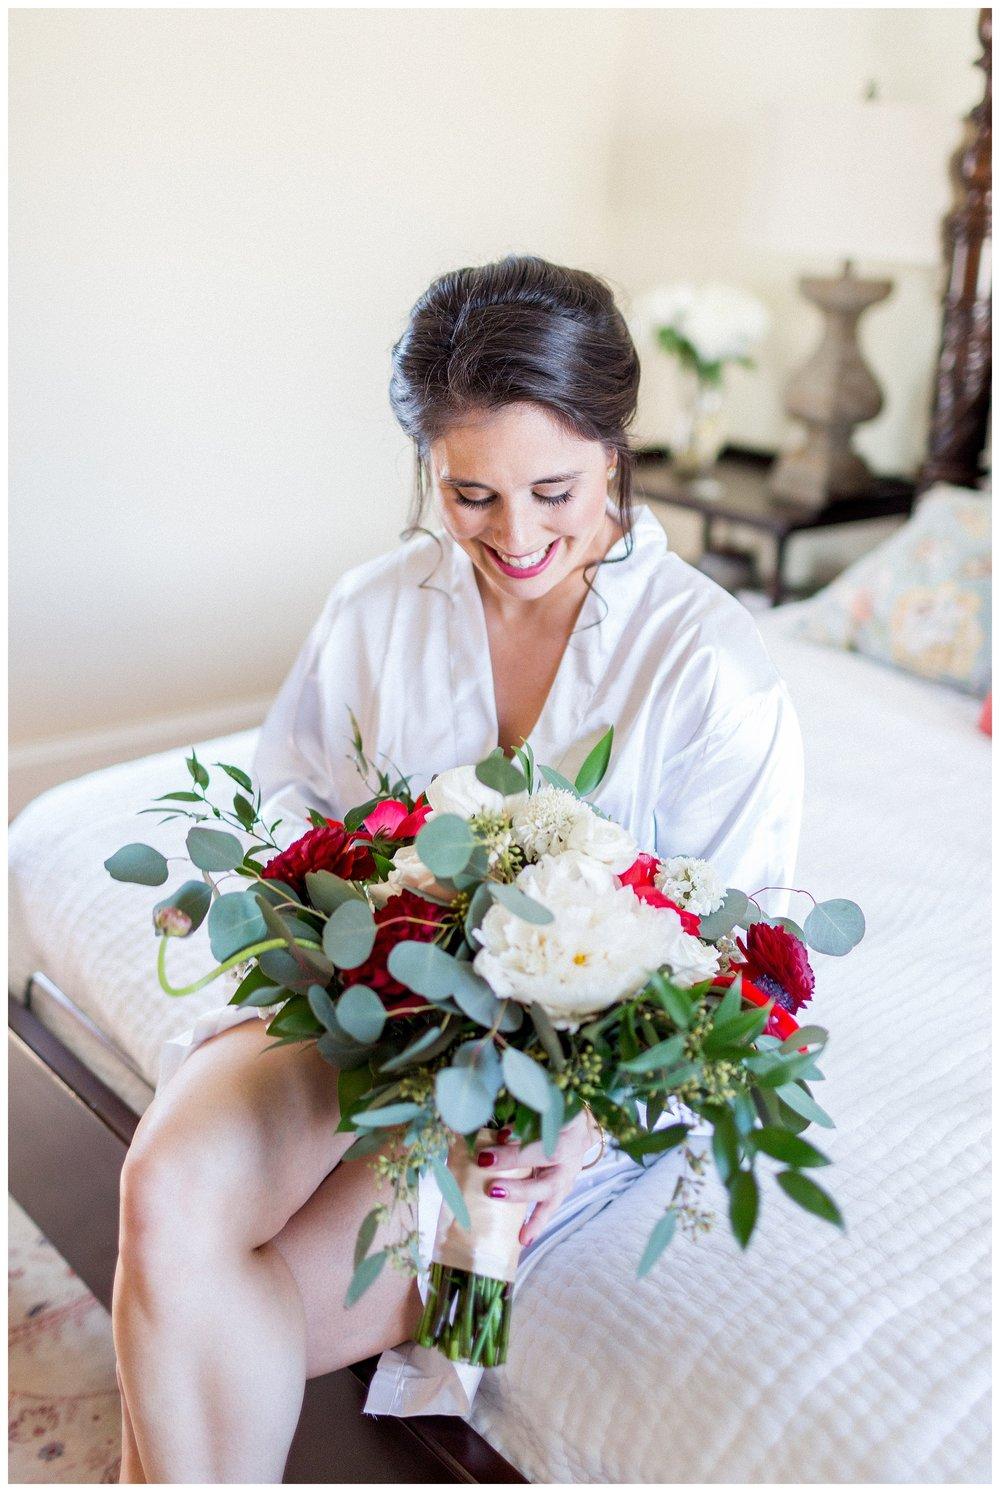 Stone Tower Winery Wedding | Virginia Winter Wedding | VA Wedding Photographer Kir Tuben_0009.jpg